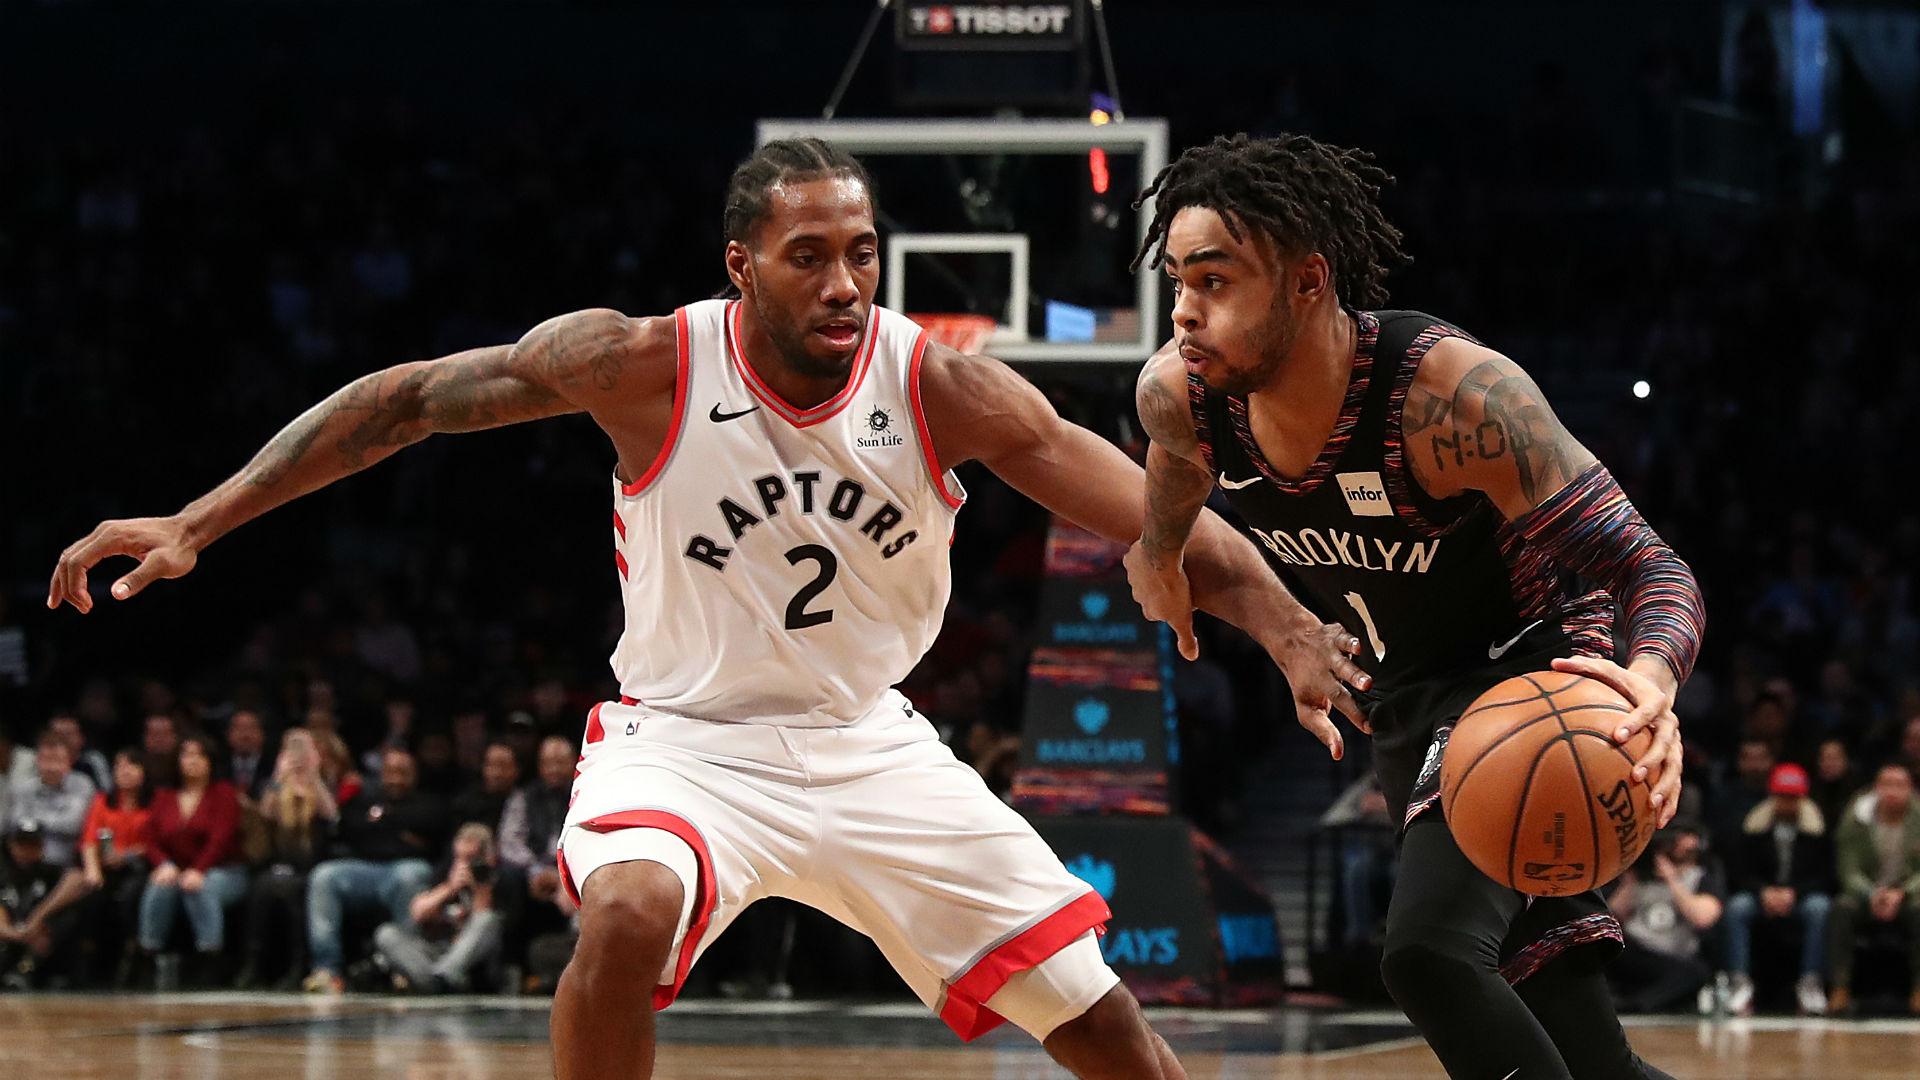 Nets Vs Raptors: Brooklyn Nets Beat Toronto Raptors In Overtime Despite 32